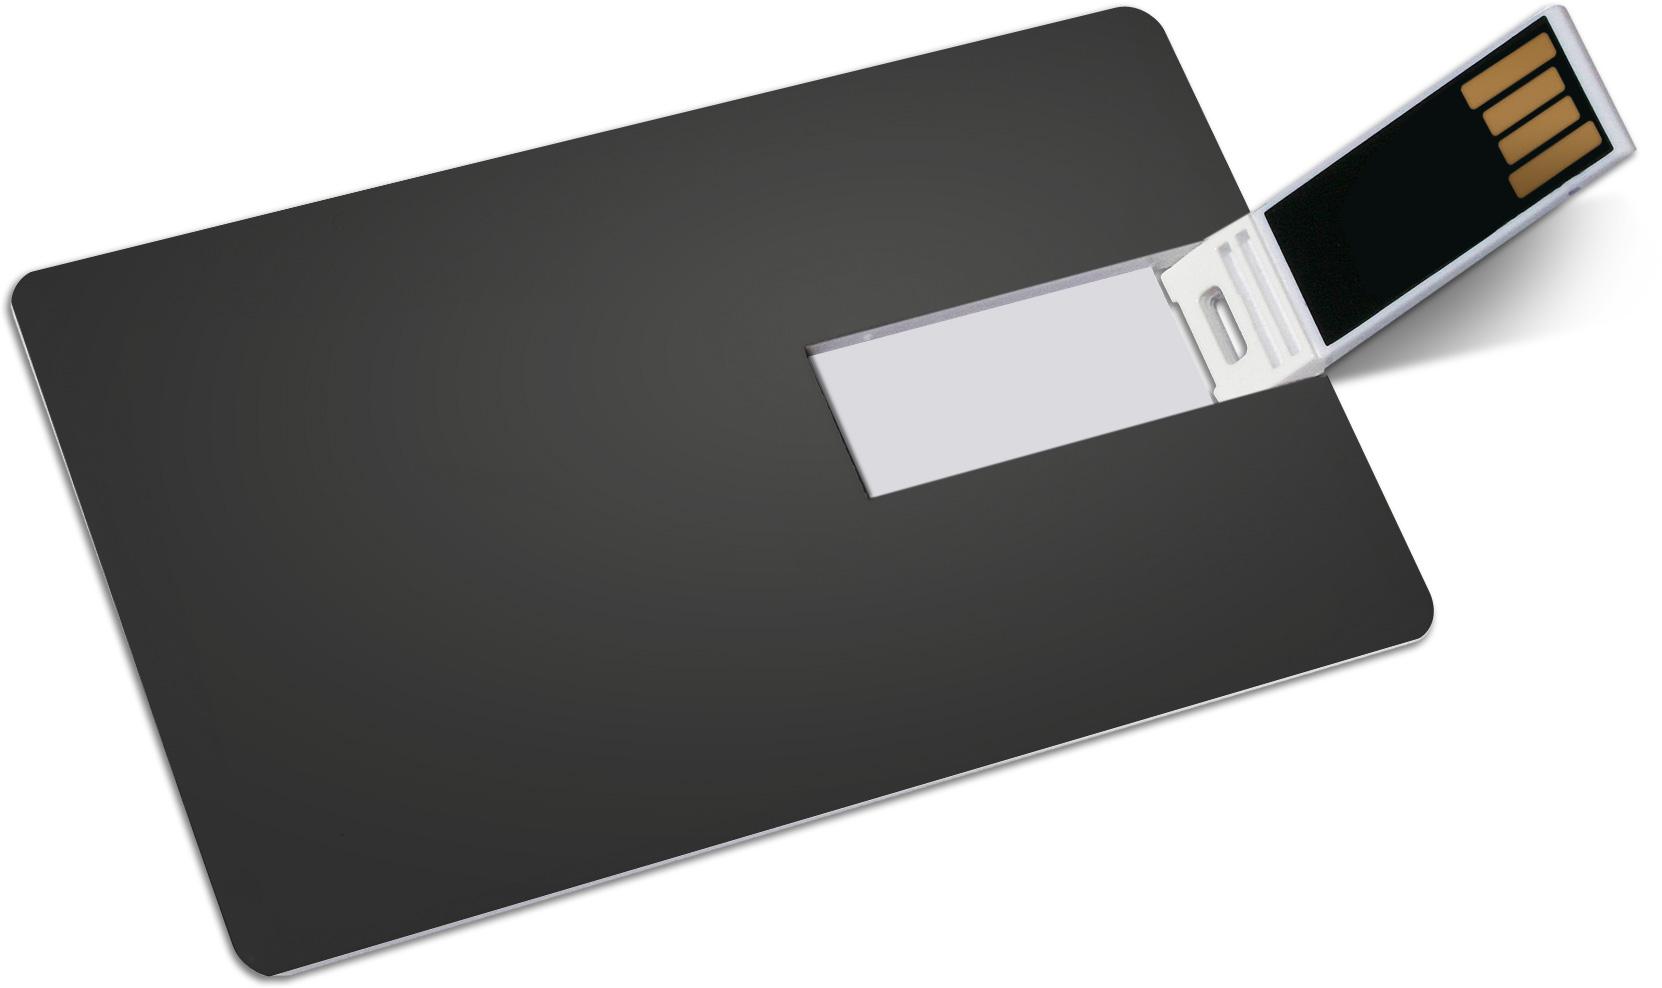 USB Card Mockup